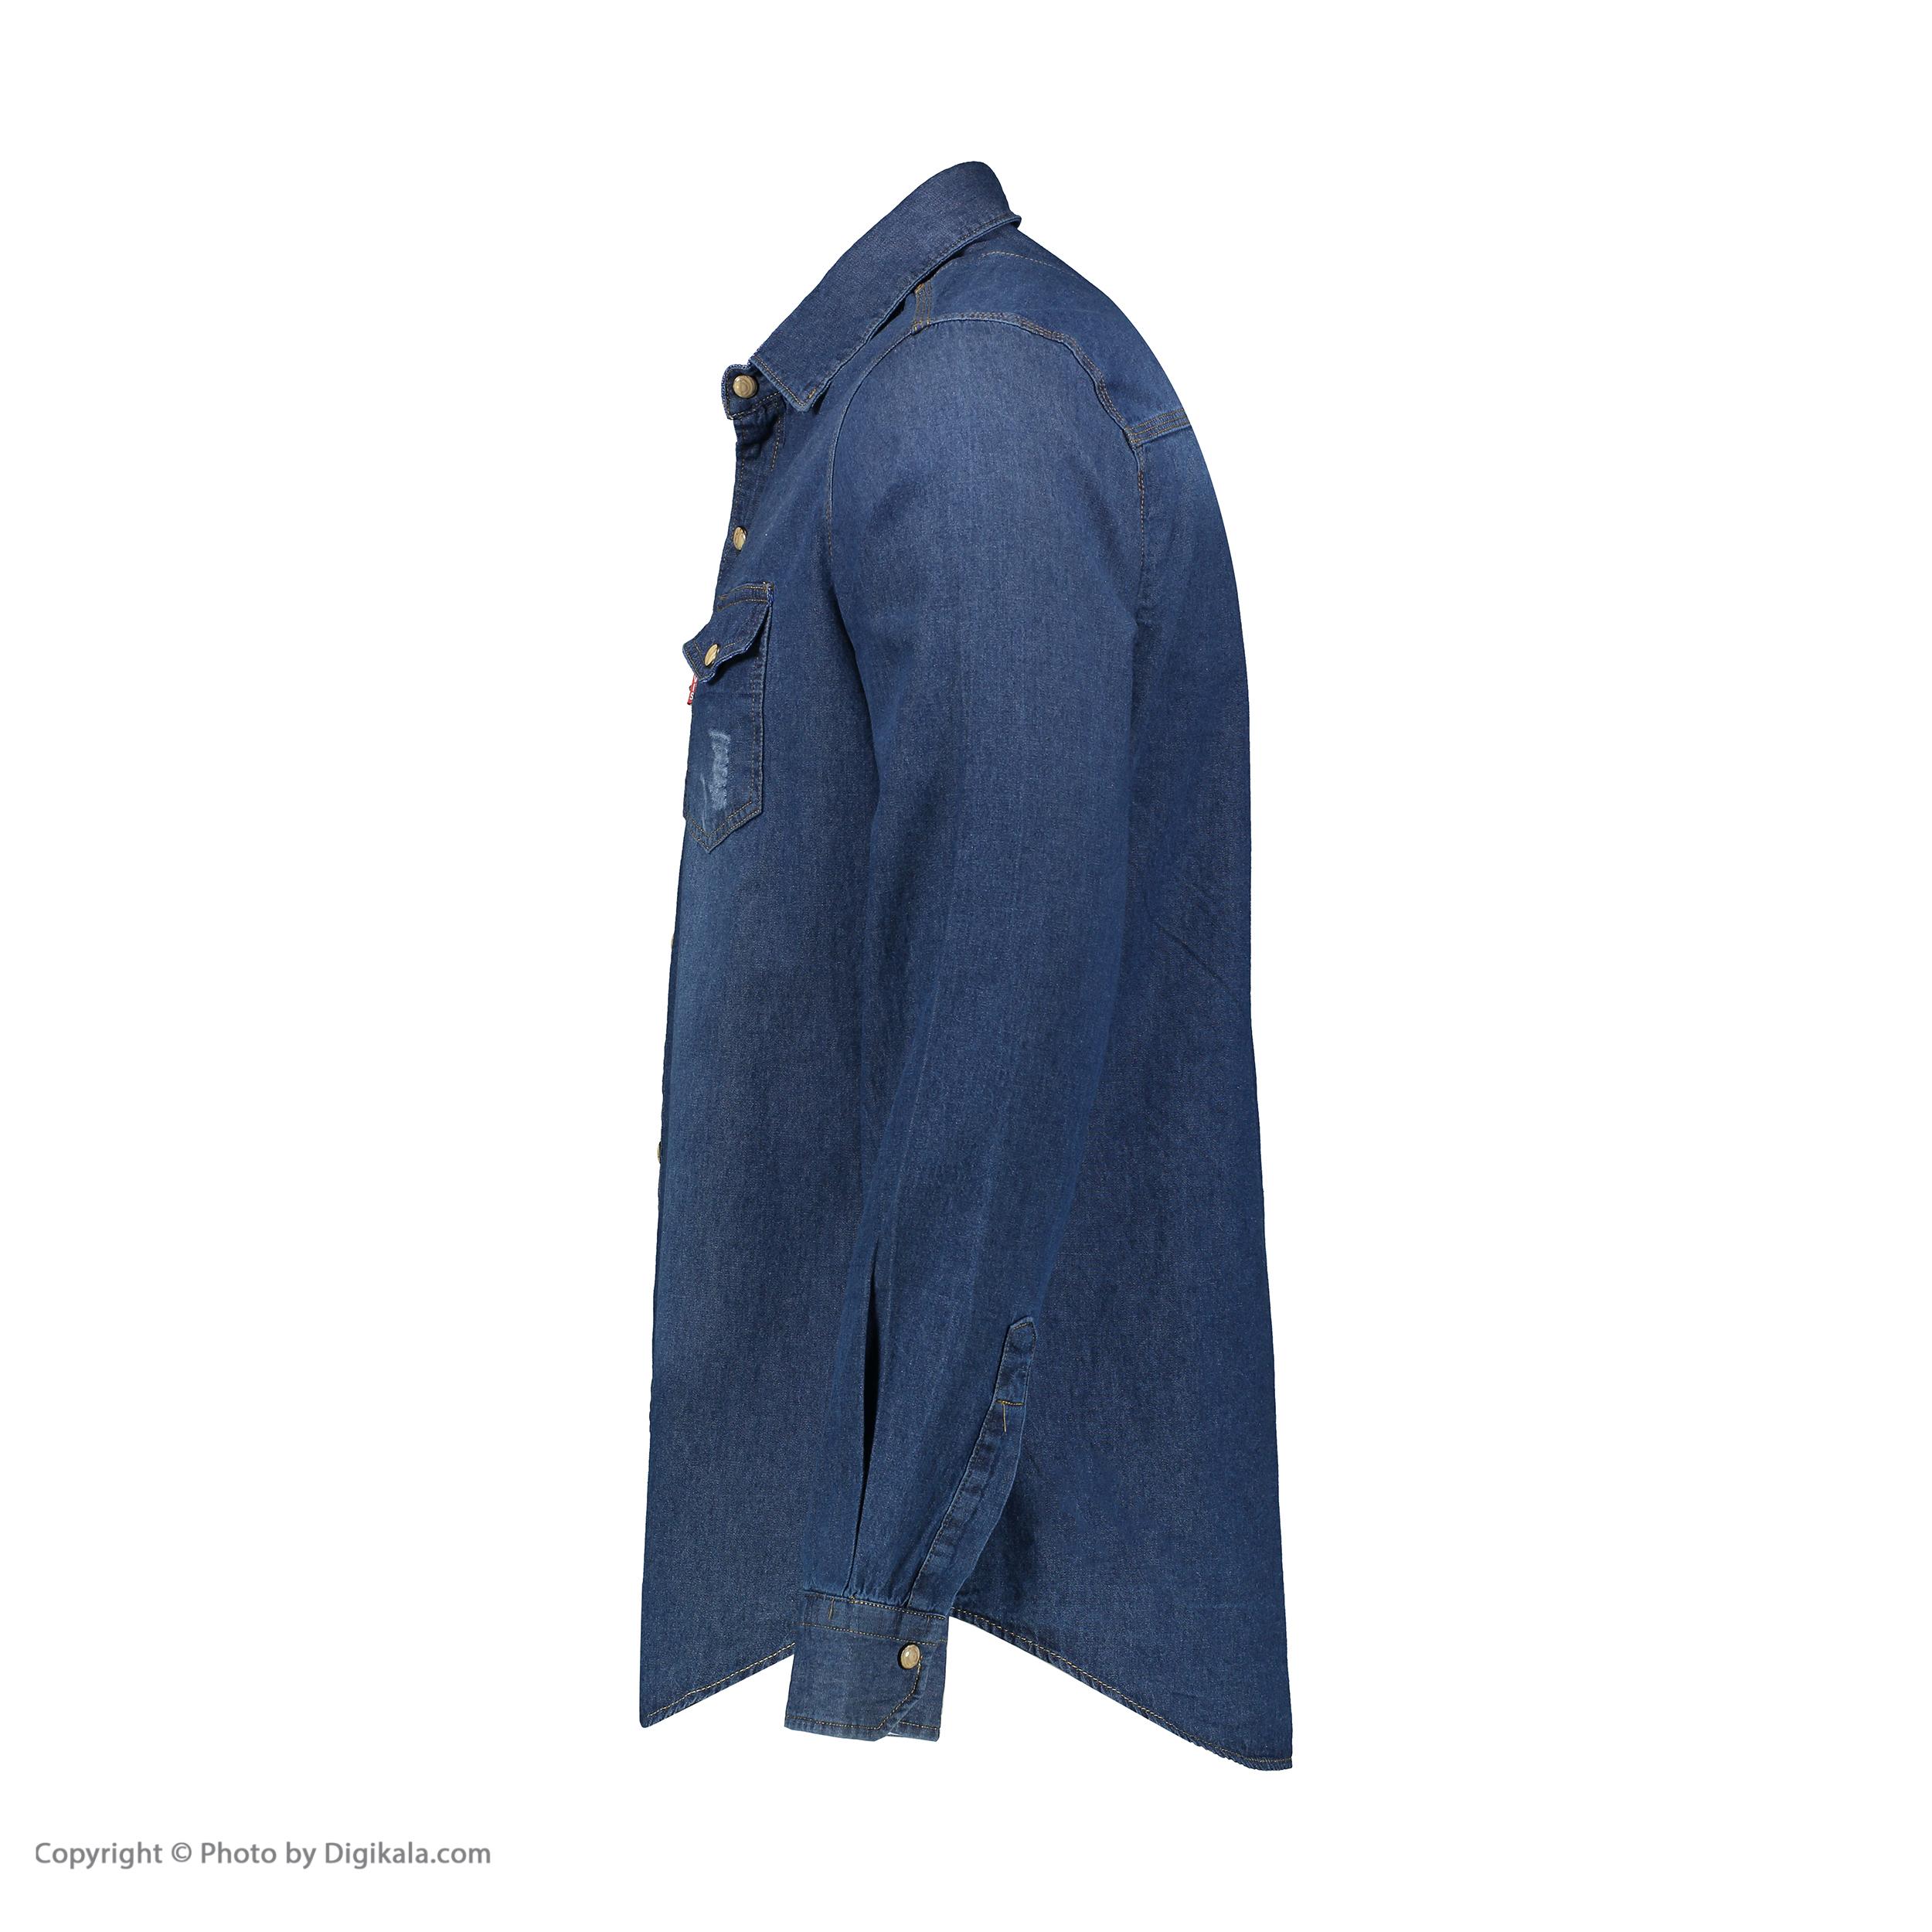 پیراهن مردانه کد PRSJD4002